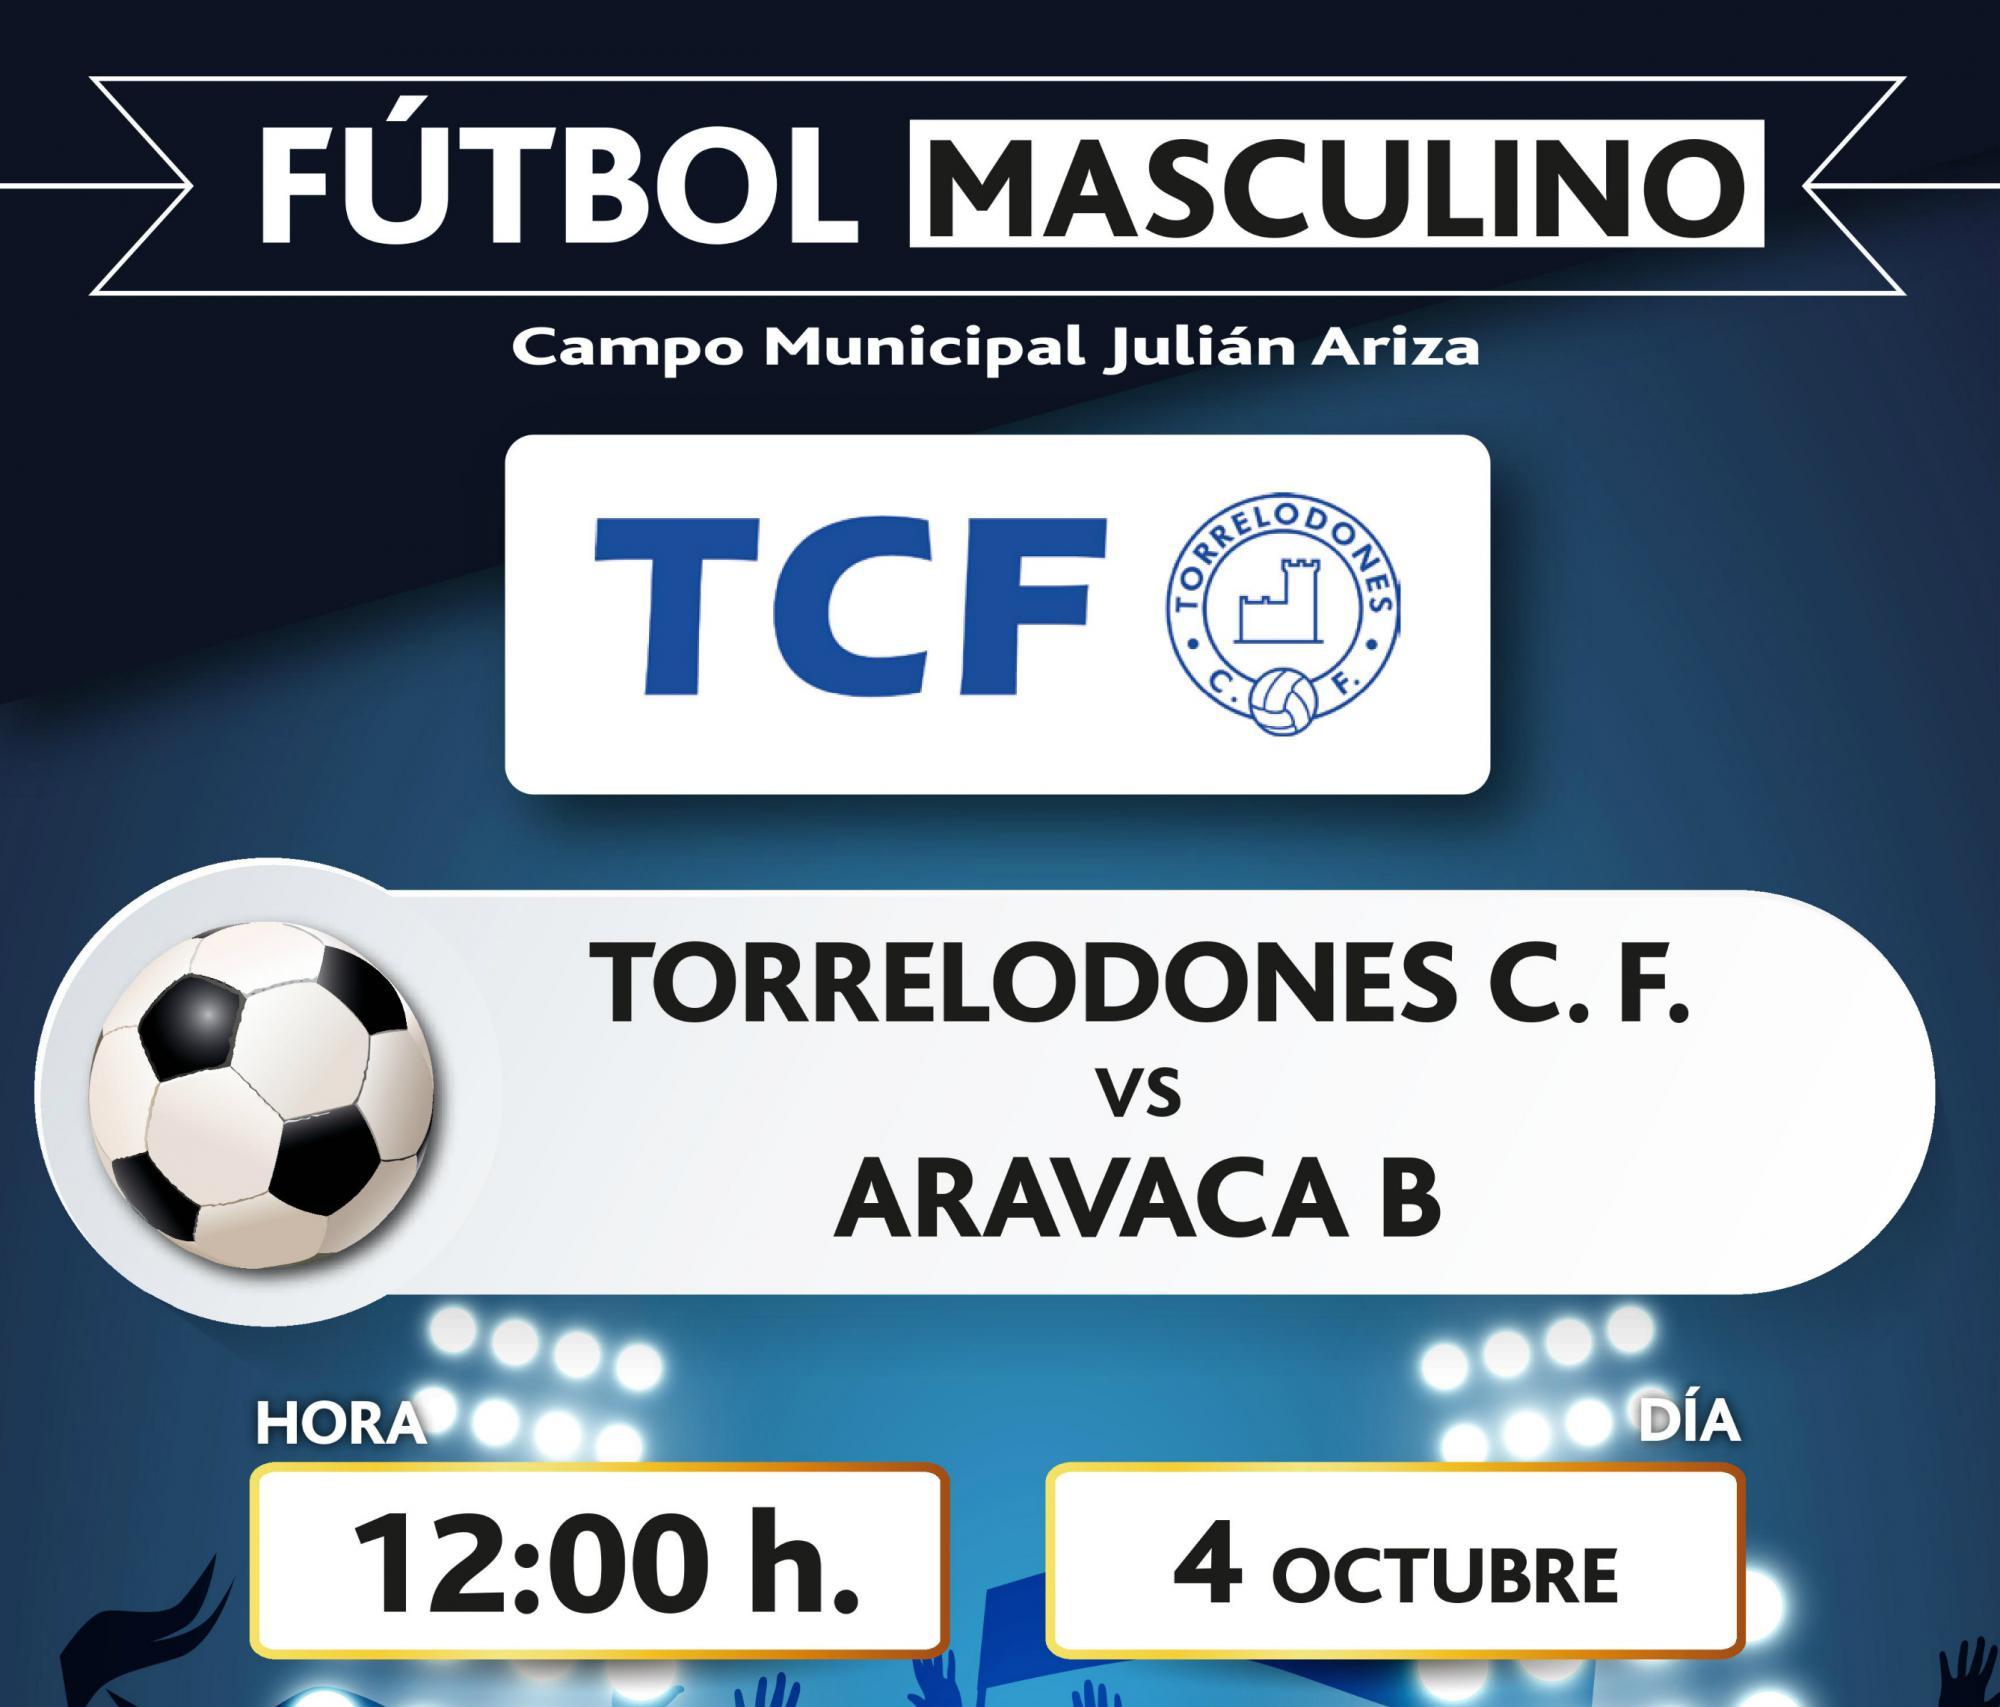 Torrelodones vs. Aravaca